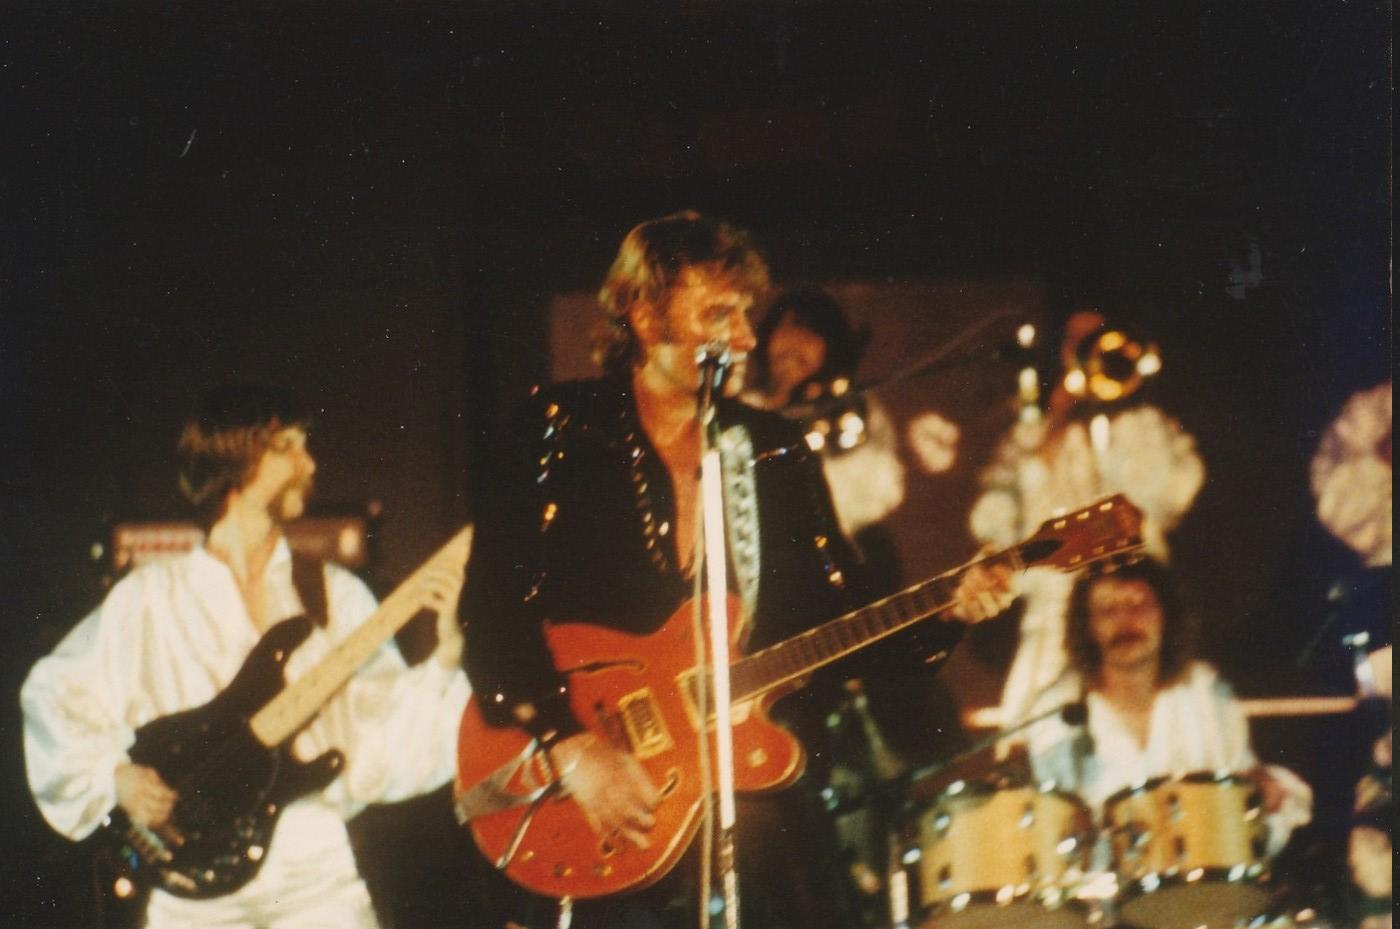 INÉDIT  :  JOHNNY HALLYDAY EN TOURNEE - HIVER 1978 -1979 ( PHOTOS INÉDITES )   Img_2631